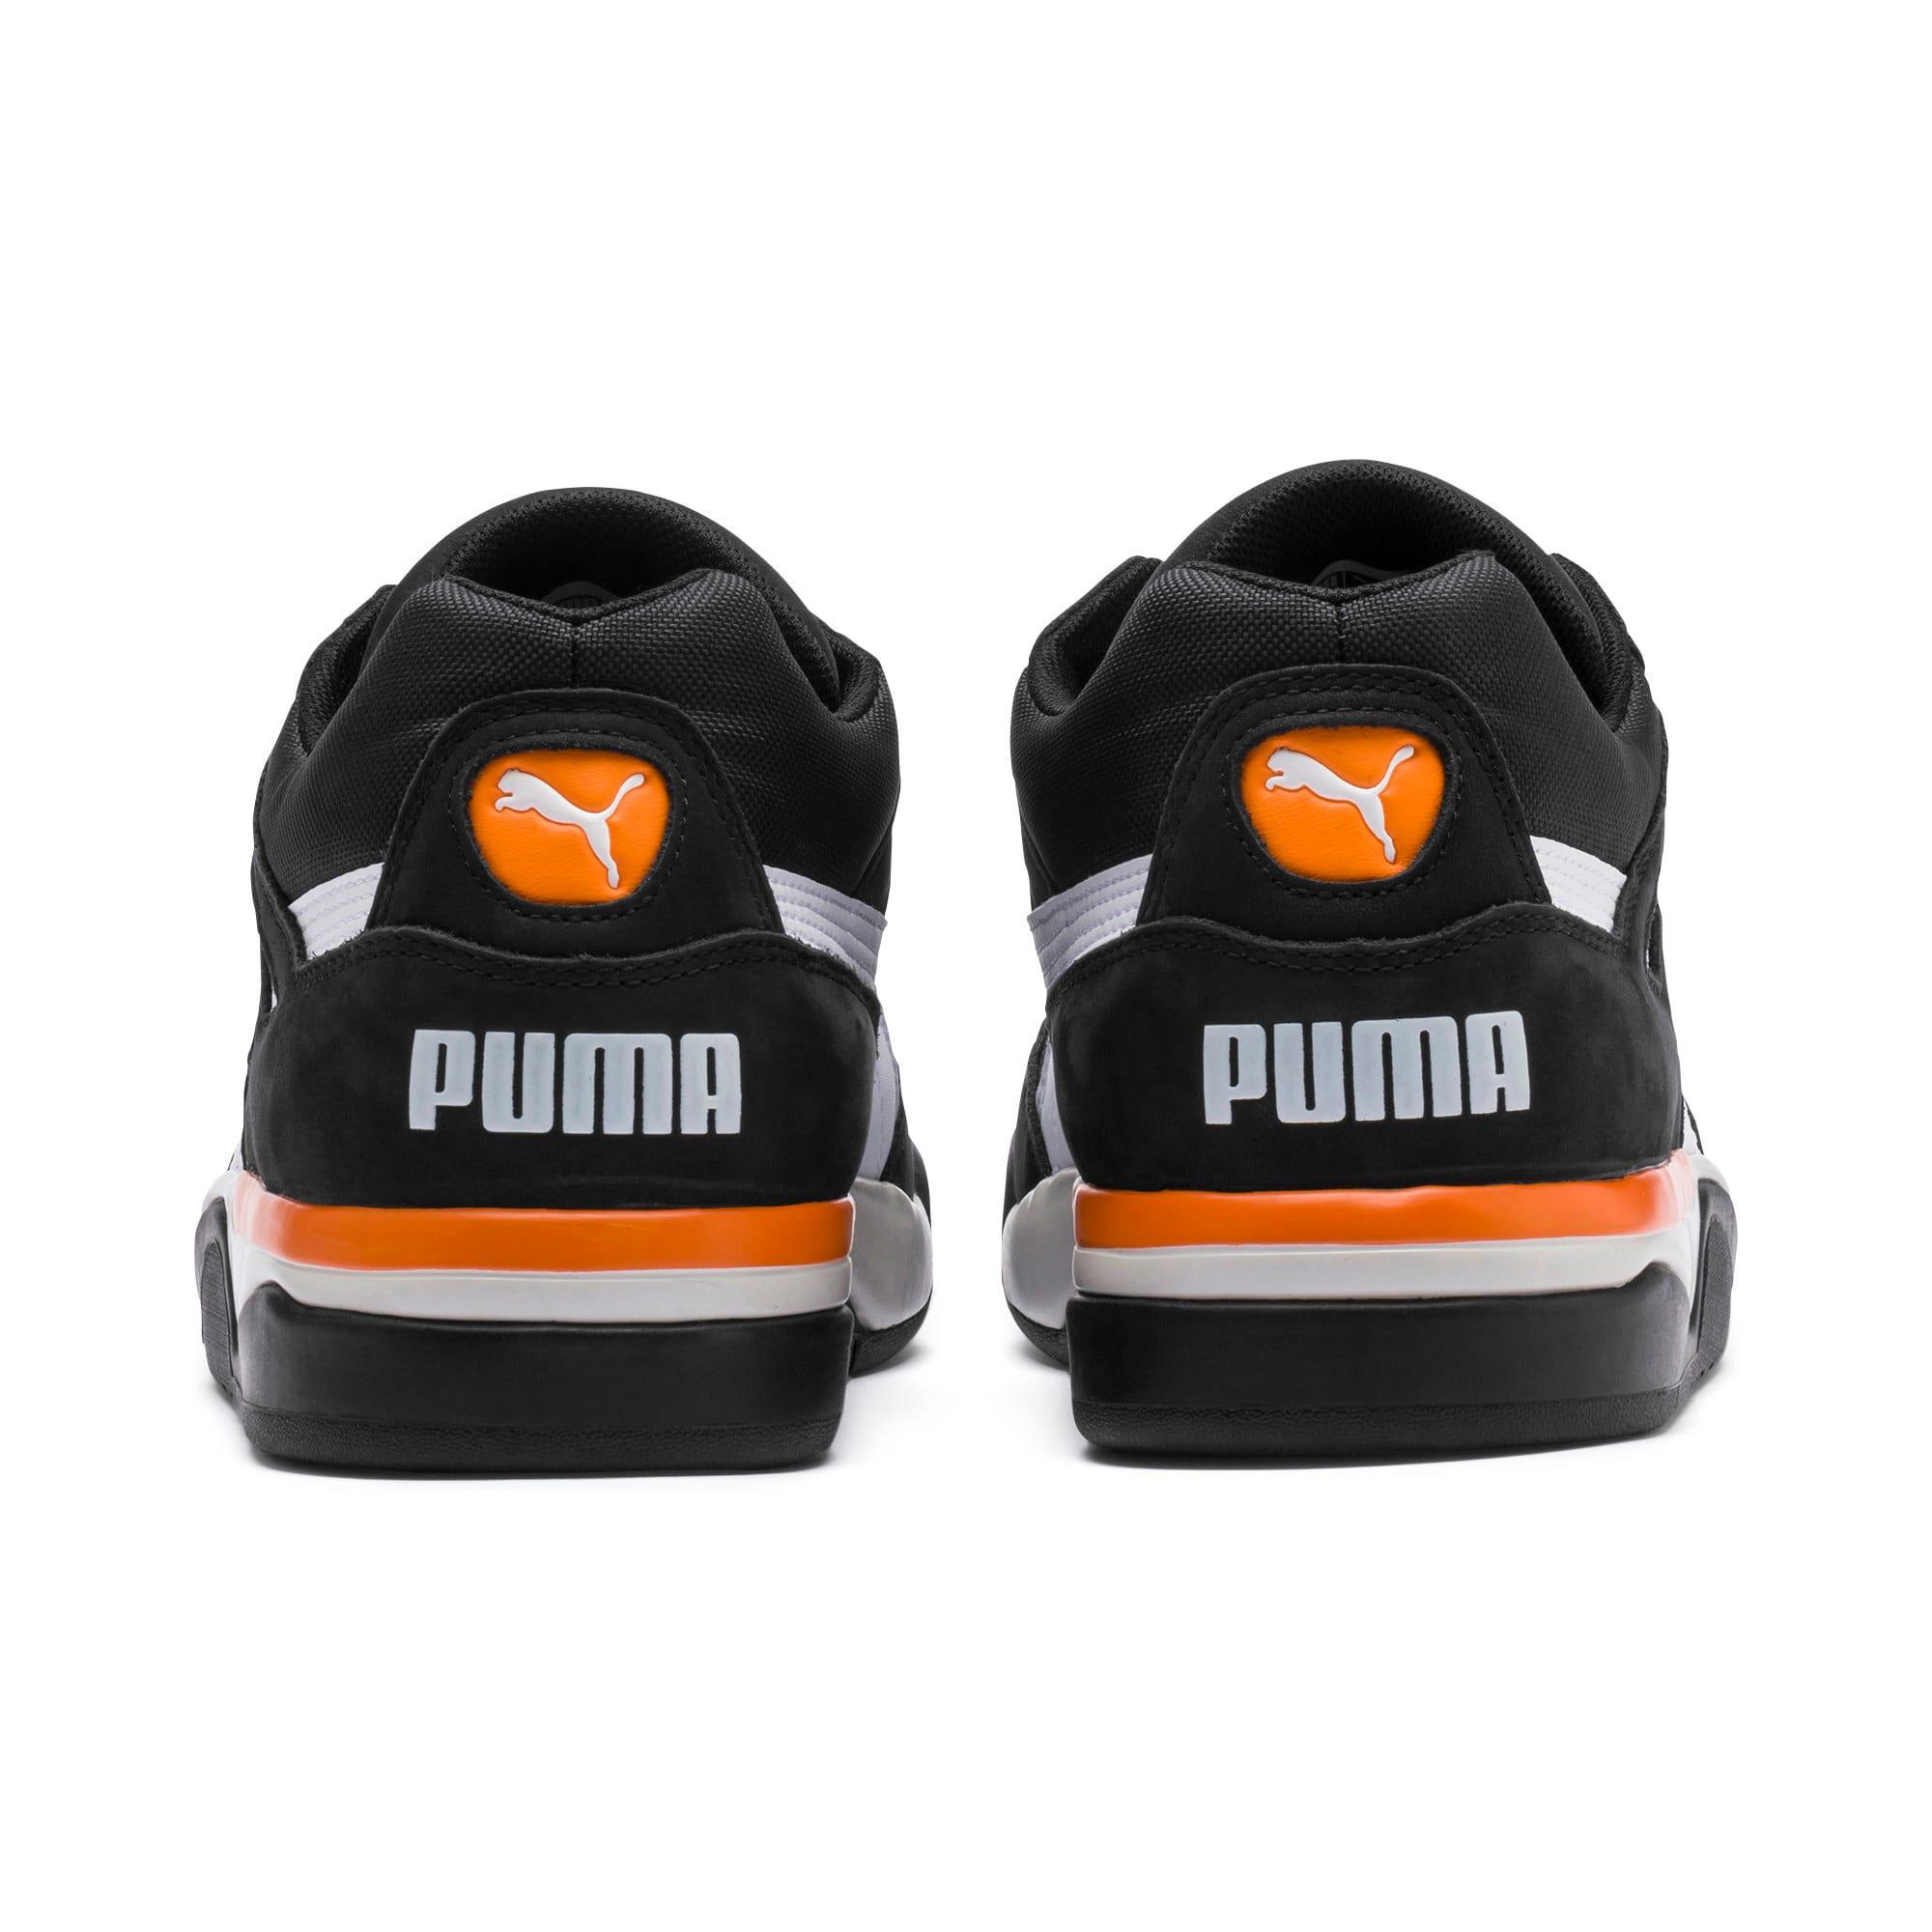 Thumbnail 3 of Palace Guard BB Sneakers, Puma Black-Puma White-, medium